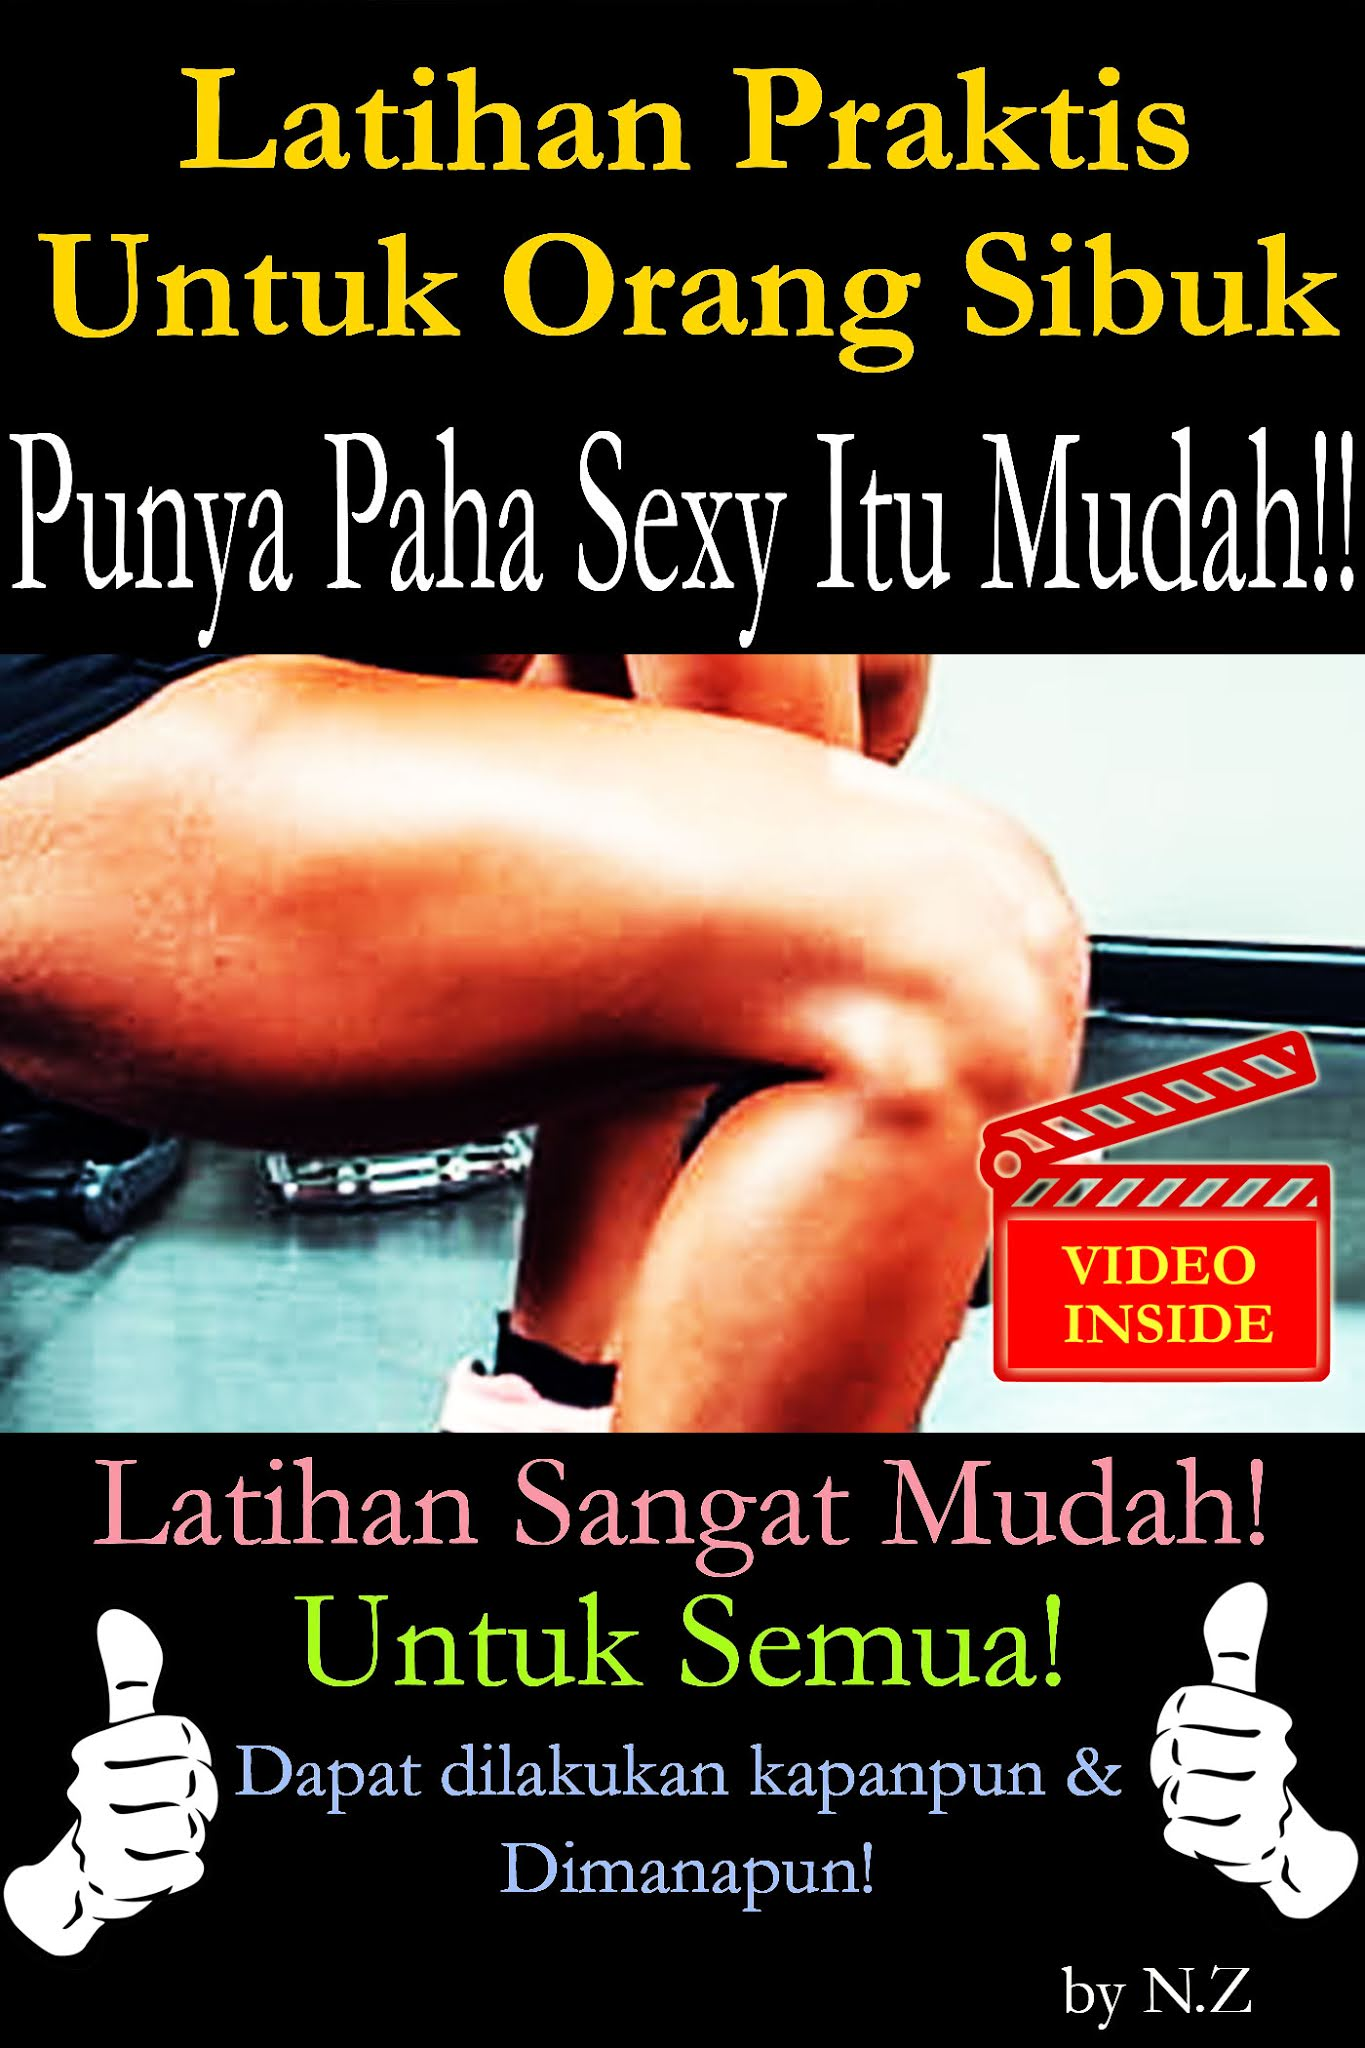 Latihan Praktis Untuk Orang Sibuk: Paha Sexy Itu Mudah!!